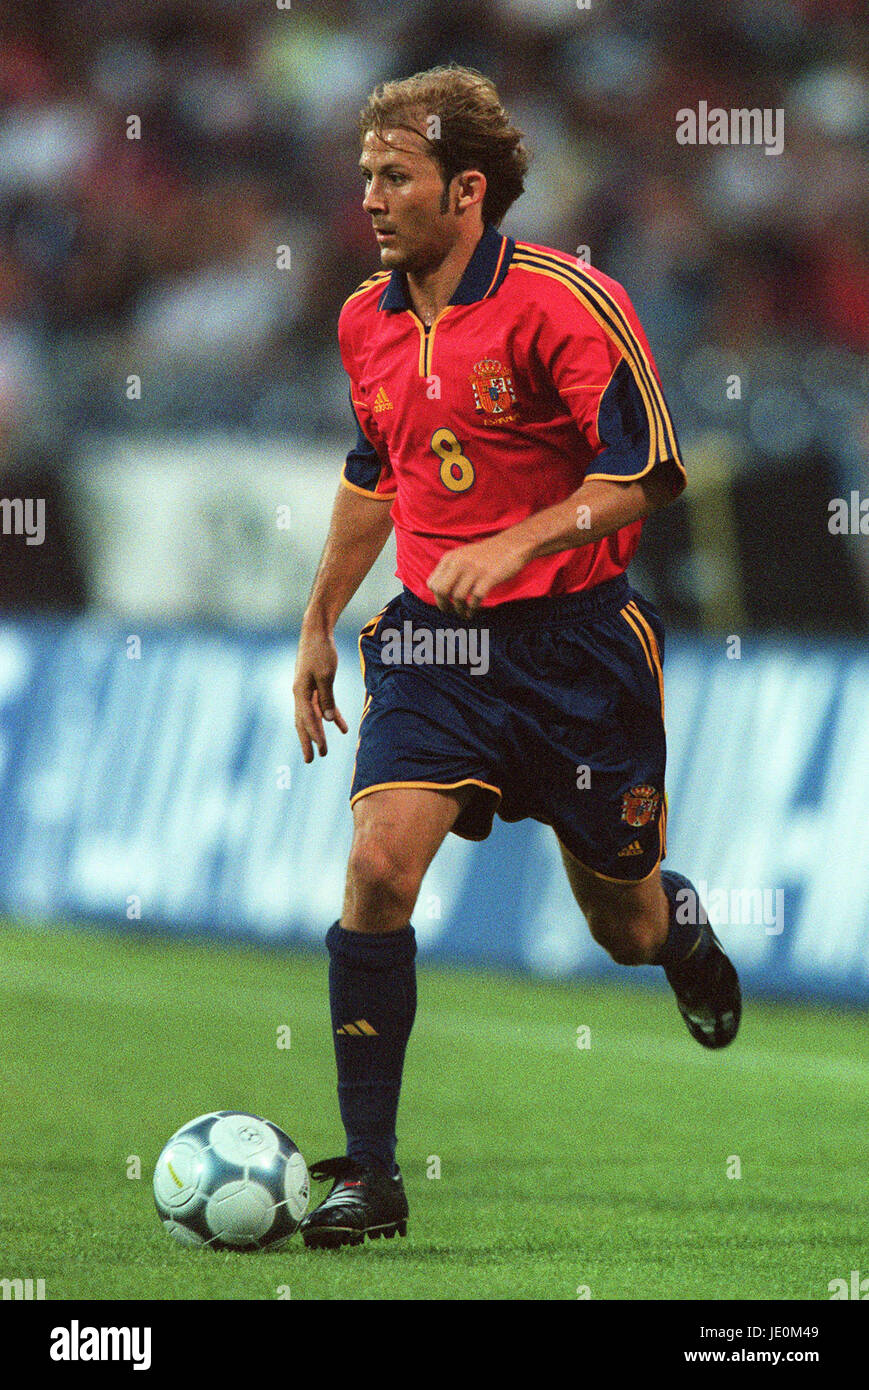 GAIZKA MENDIETA SPAIN HANNOVER GERMANY 16 August 2000 Stock